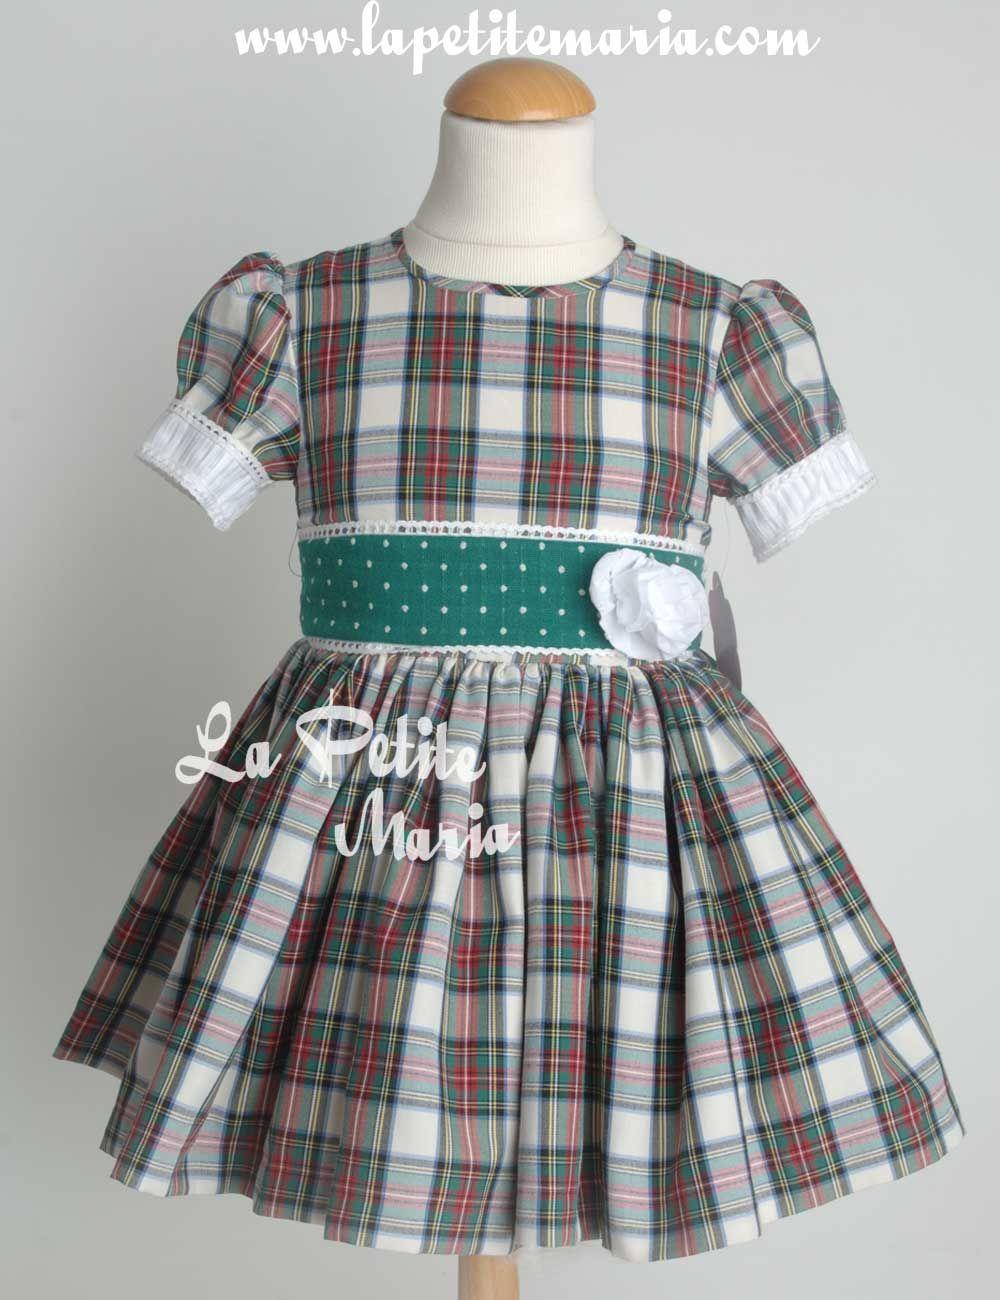 b582d0efb Vestidos Para Niñas Pequeñas, Vestidos De Invierno, Ropa De Moda, Moda Para  Niñas